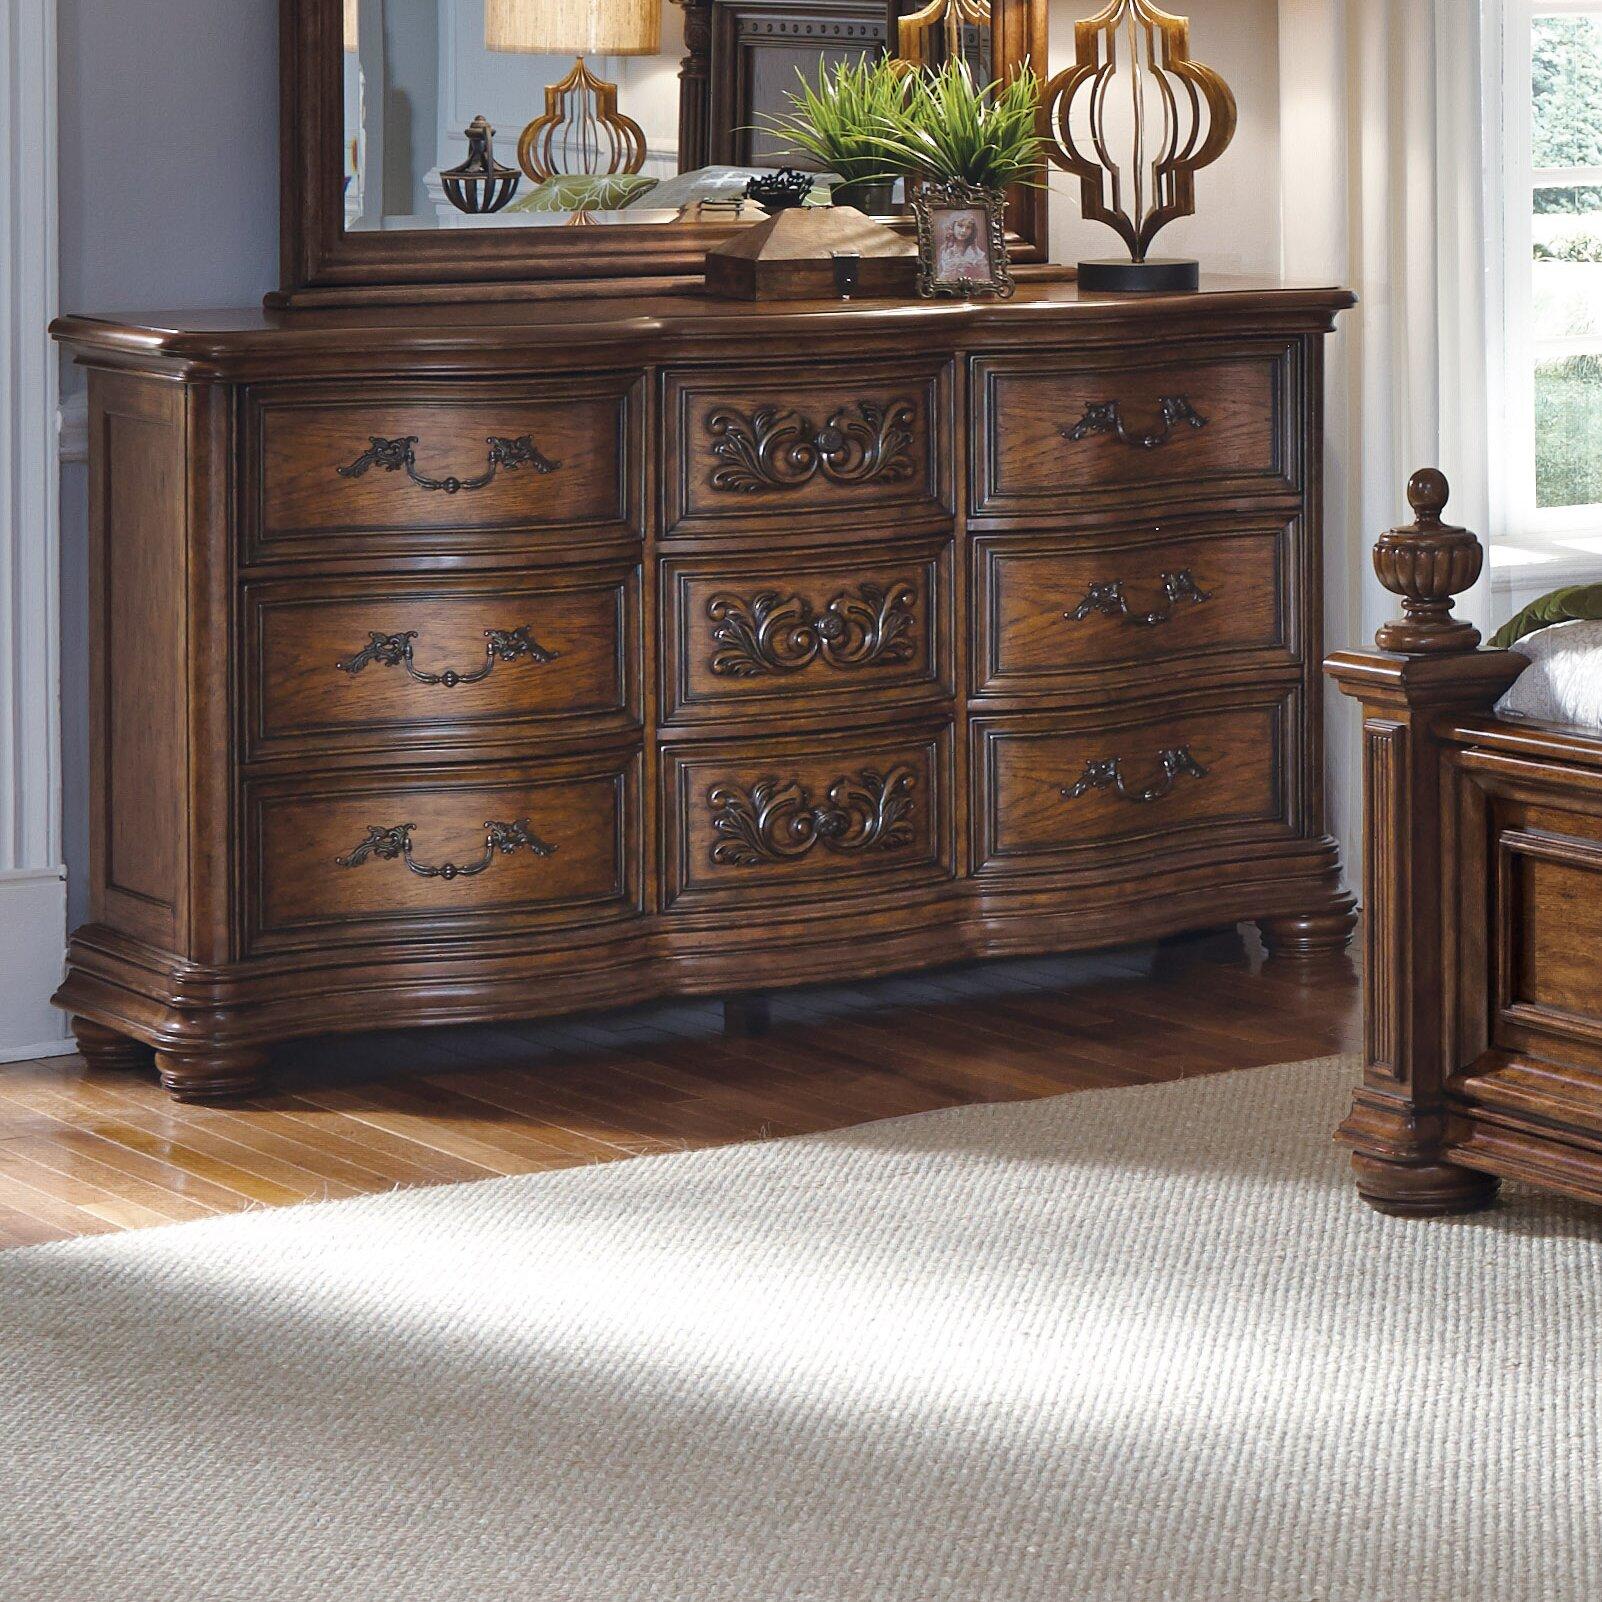 Pulaski Furniture Bedroom Sets Pulaski Cheswick Four Poster Customizable Bedroom Set Reviews